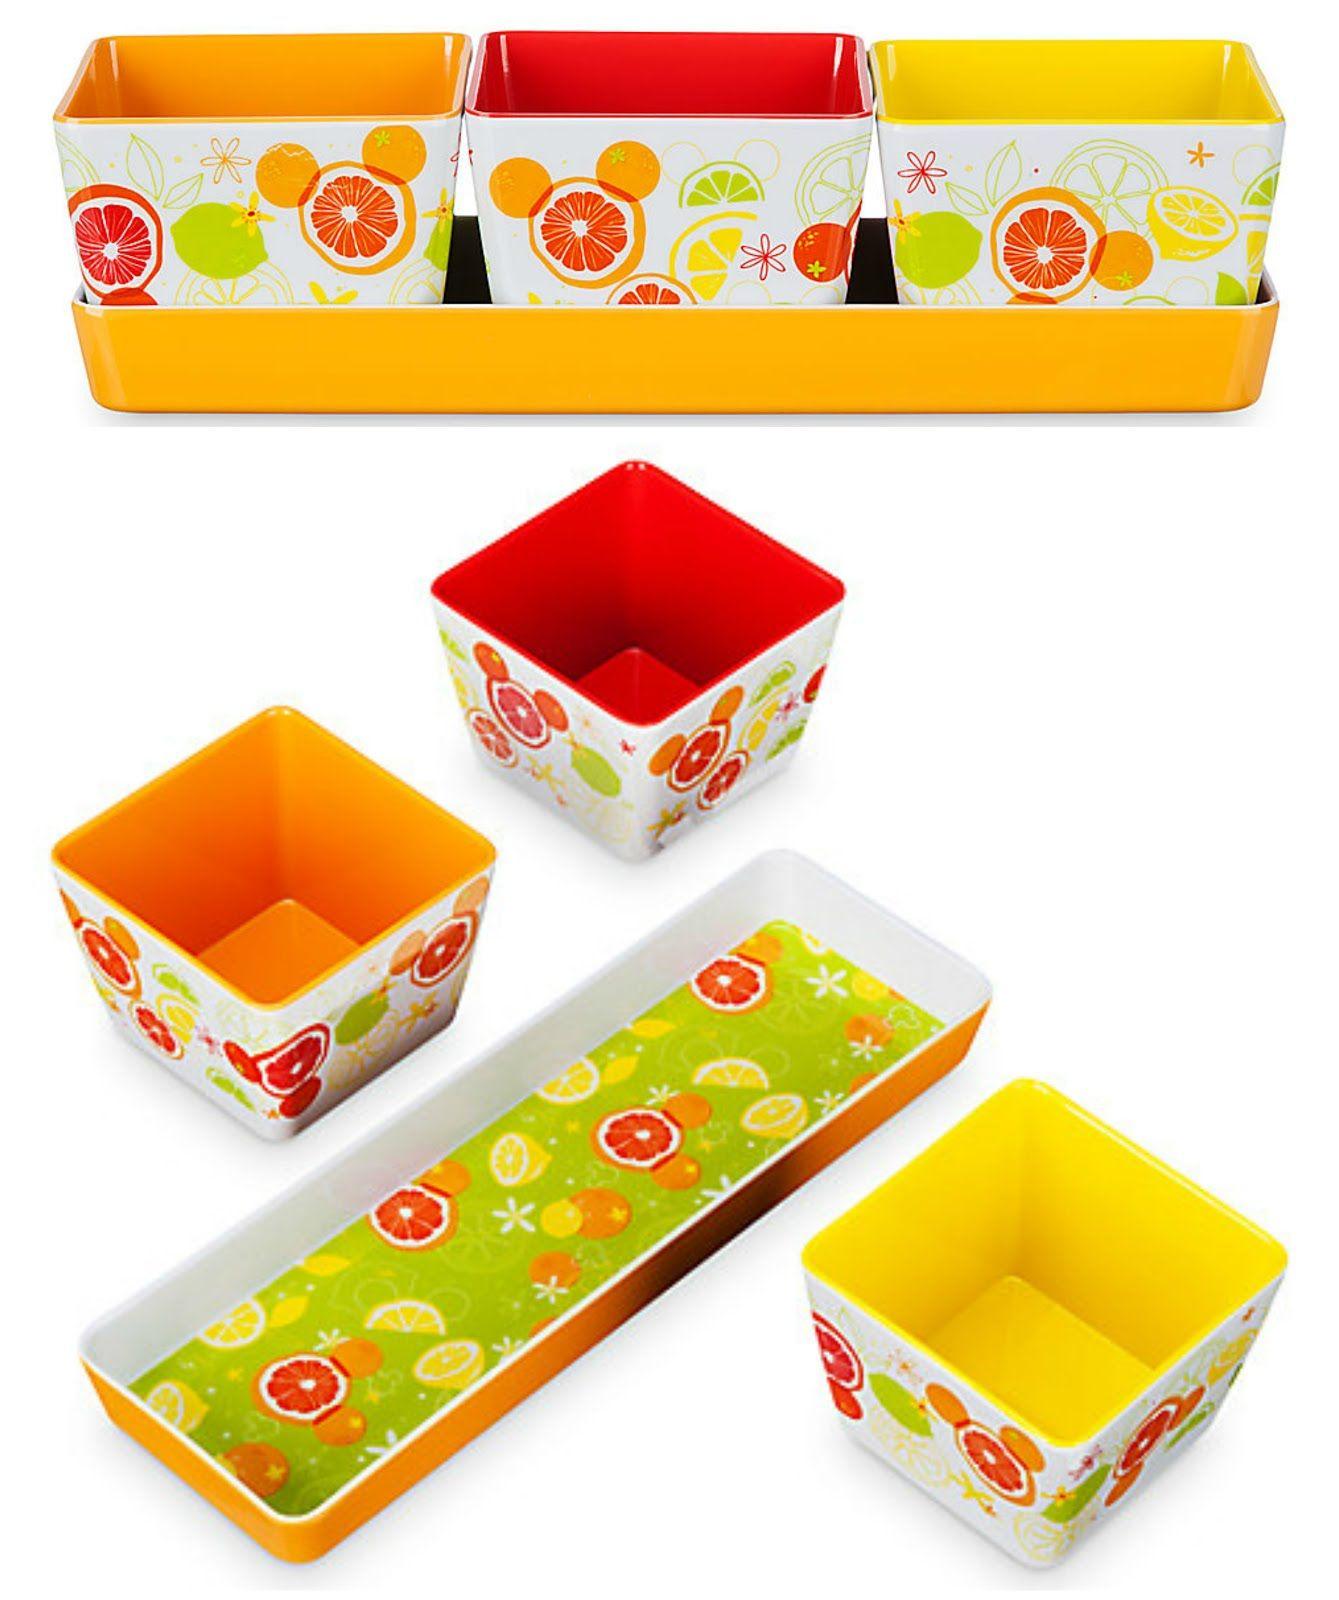 Cἶ৳ƦนᎦ😊ℓღⱴε💚🌸 Appetizer serving set, Serving set, Citrus